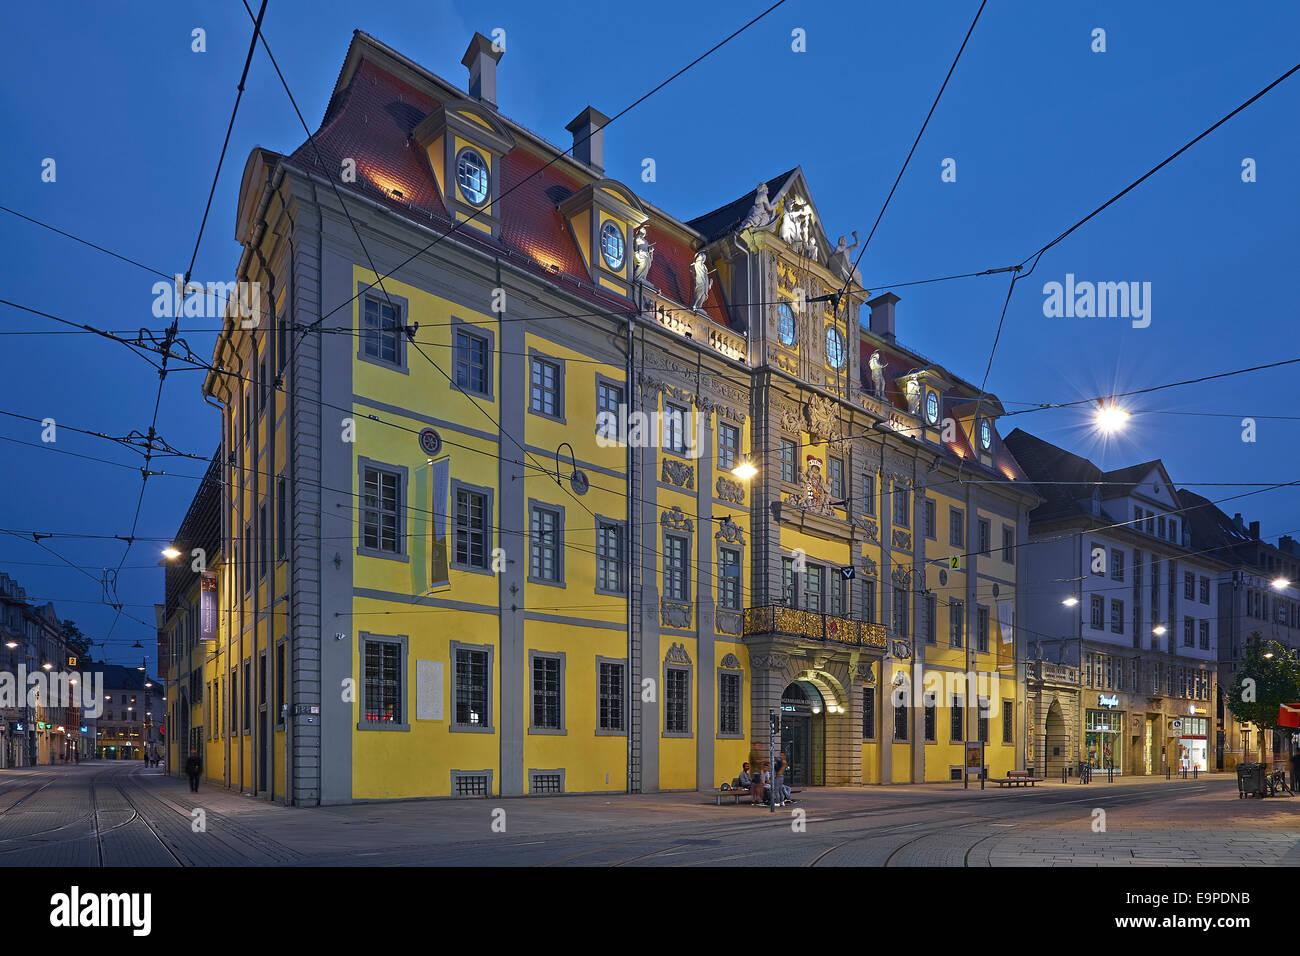 Erfurt Anger Museum, Germany - Stock Image